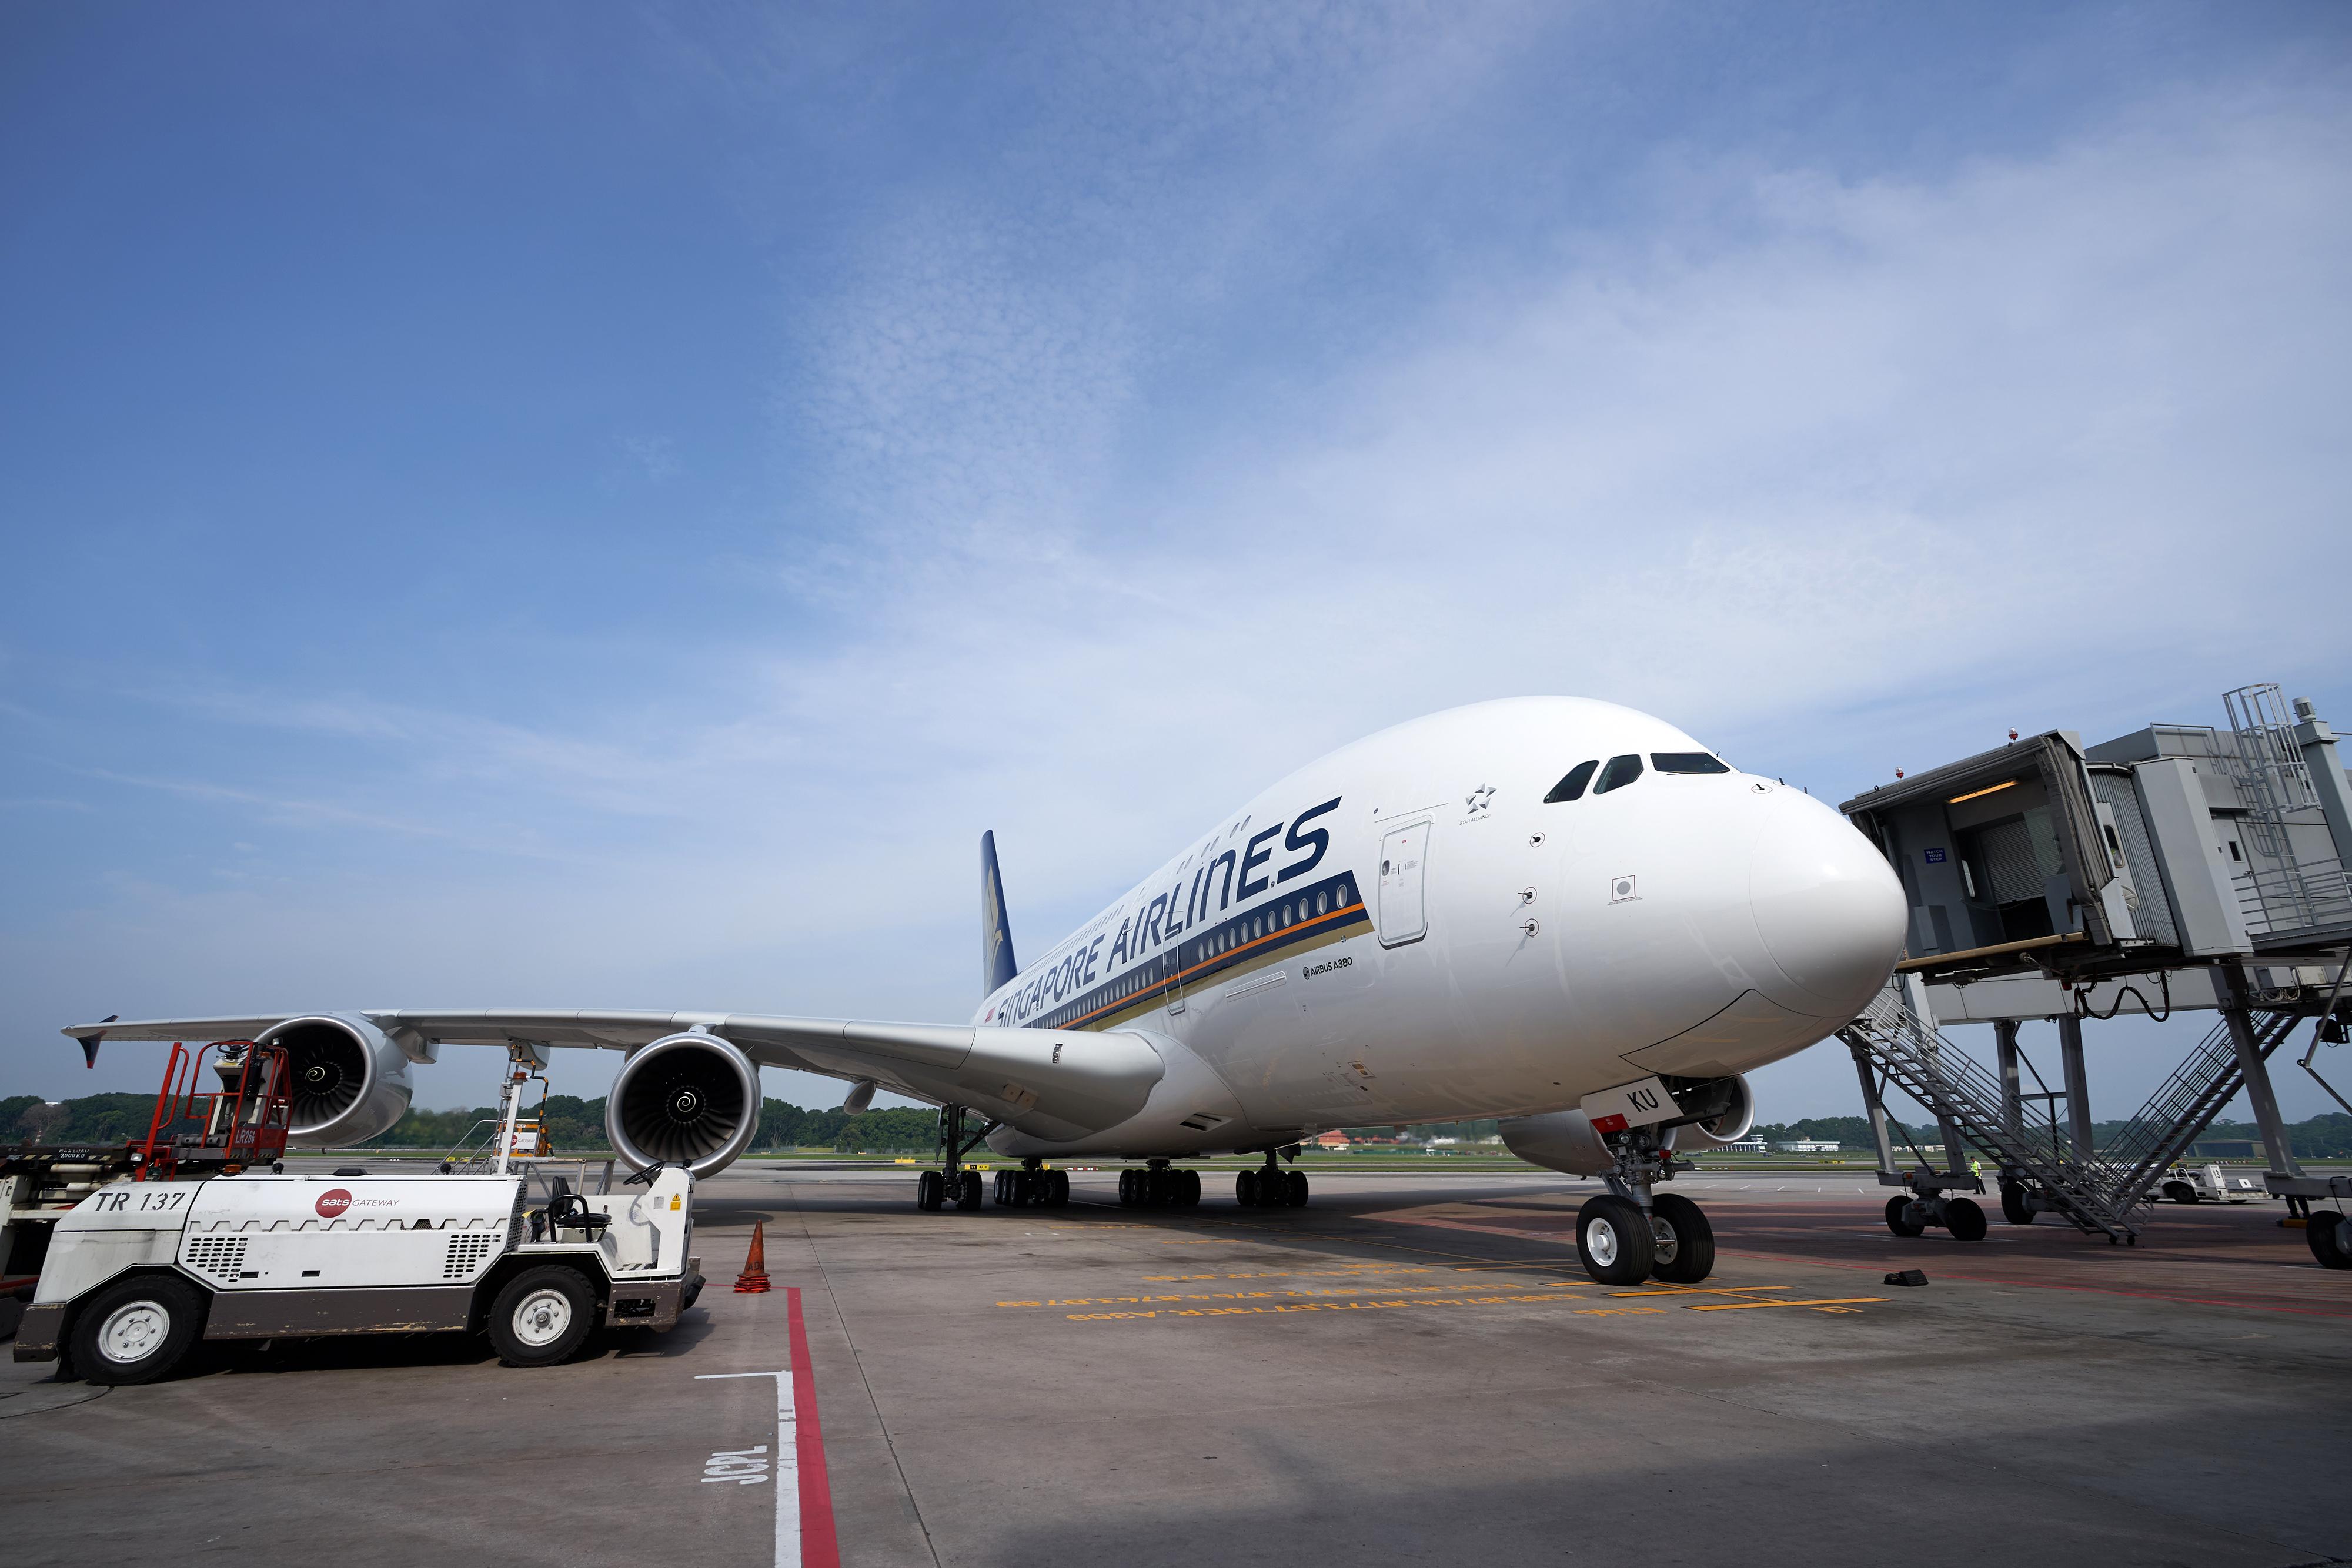 Turkish Airlines Travel Insurance